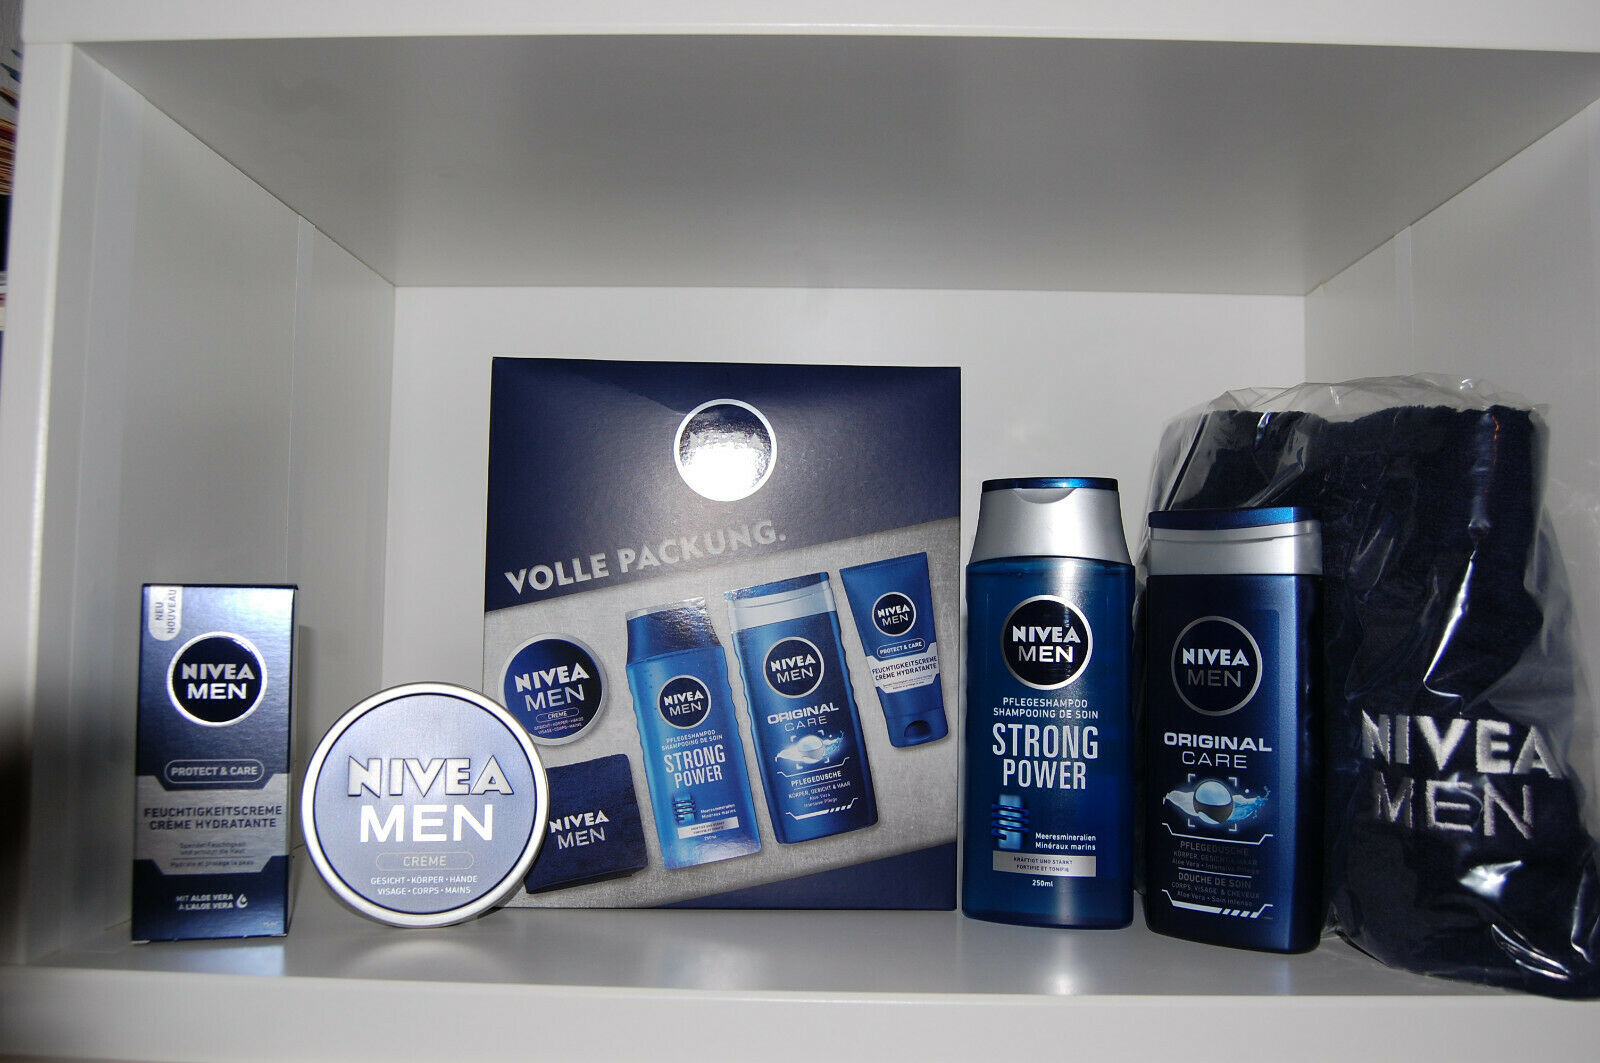 NIVEA MEN Geschenkset 5tlg Gesichtscreme + Duschgel + Shampoo + Creme +Sporttuch